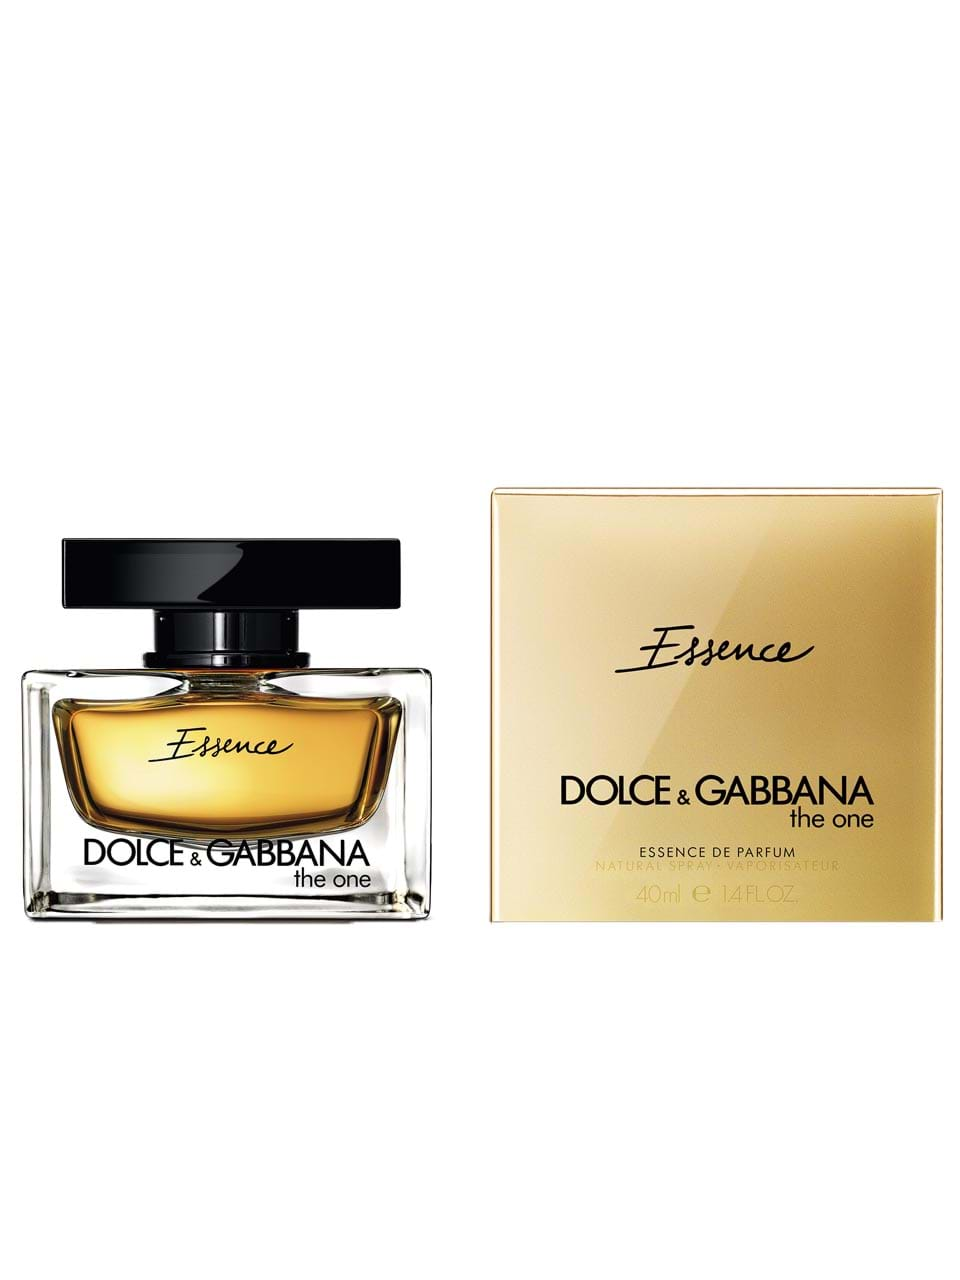 40 One Eau The Gabbana Ml Dolceamp; Parfum De Essence f7gby6IYv